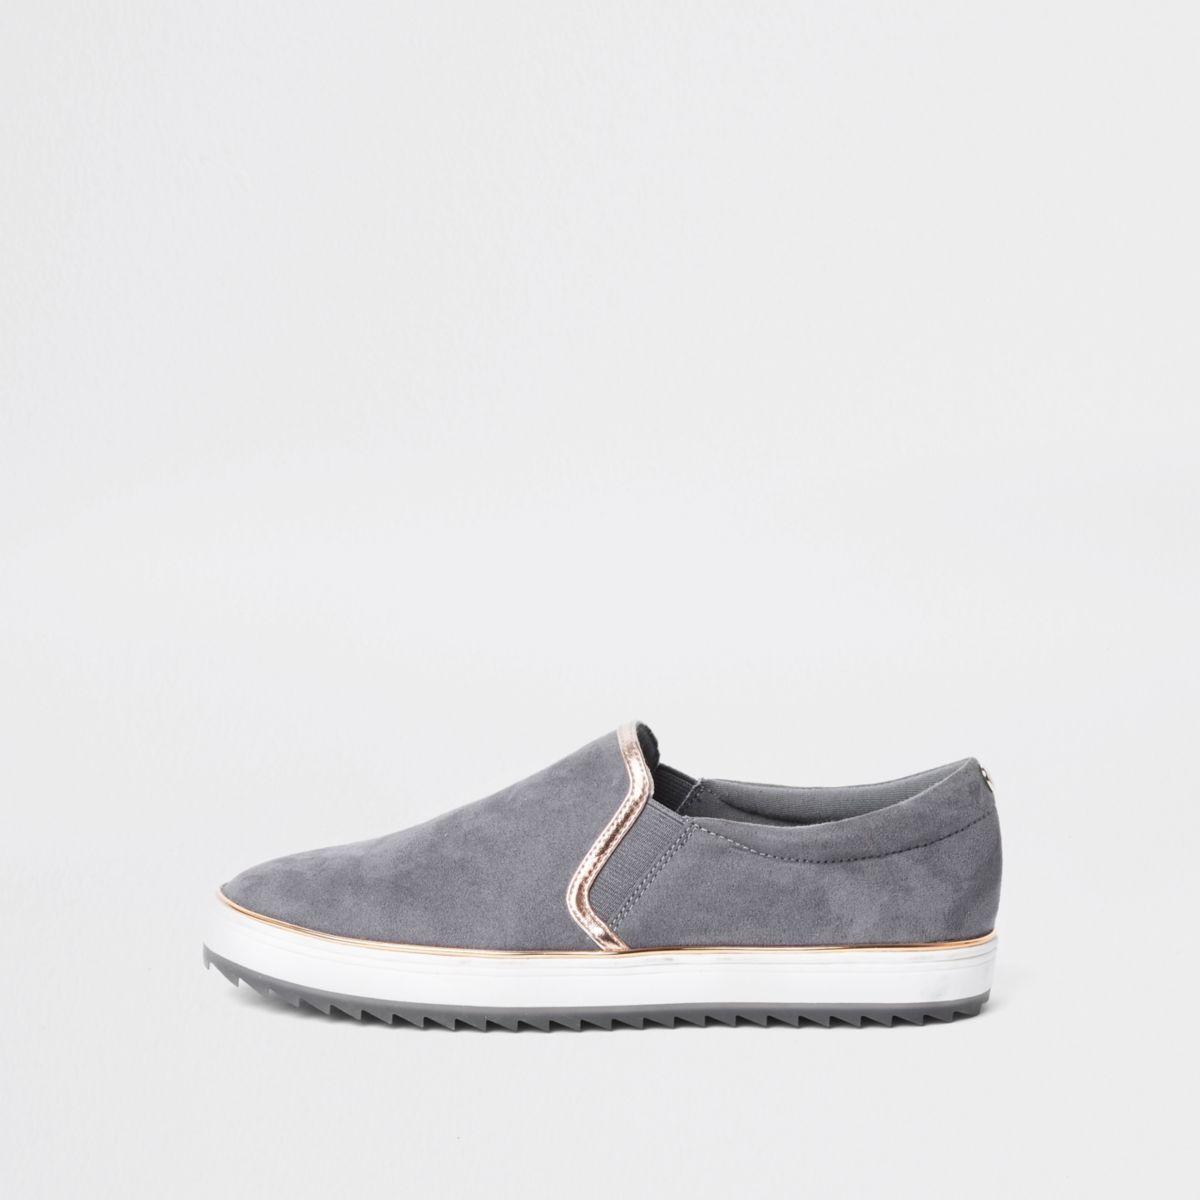 Grey slip on plimsolls | Boot shoes